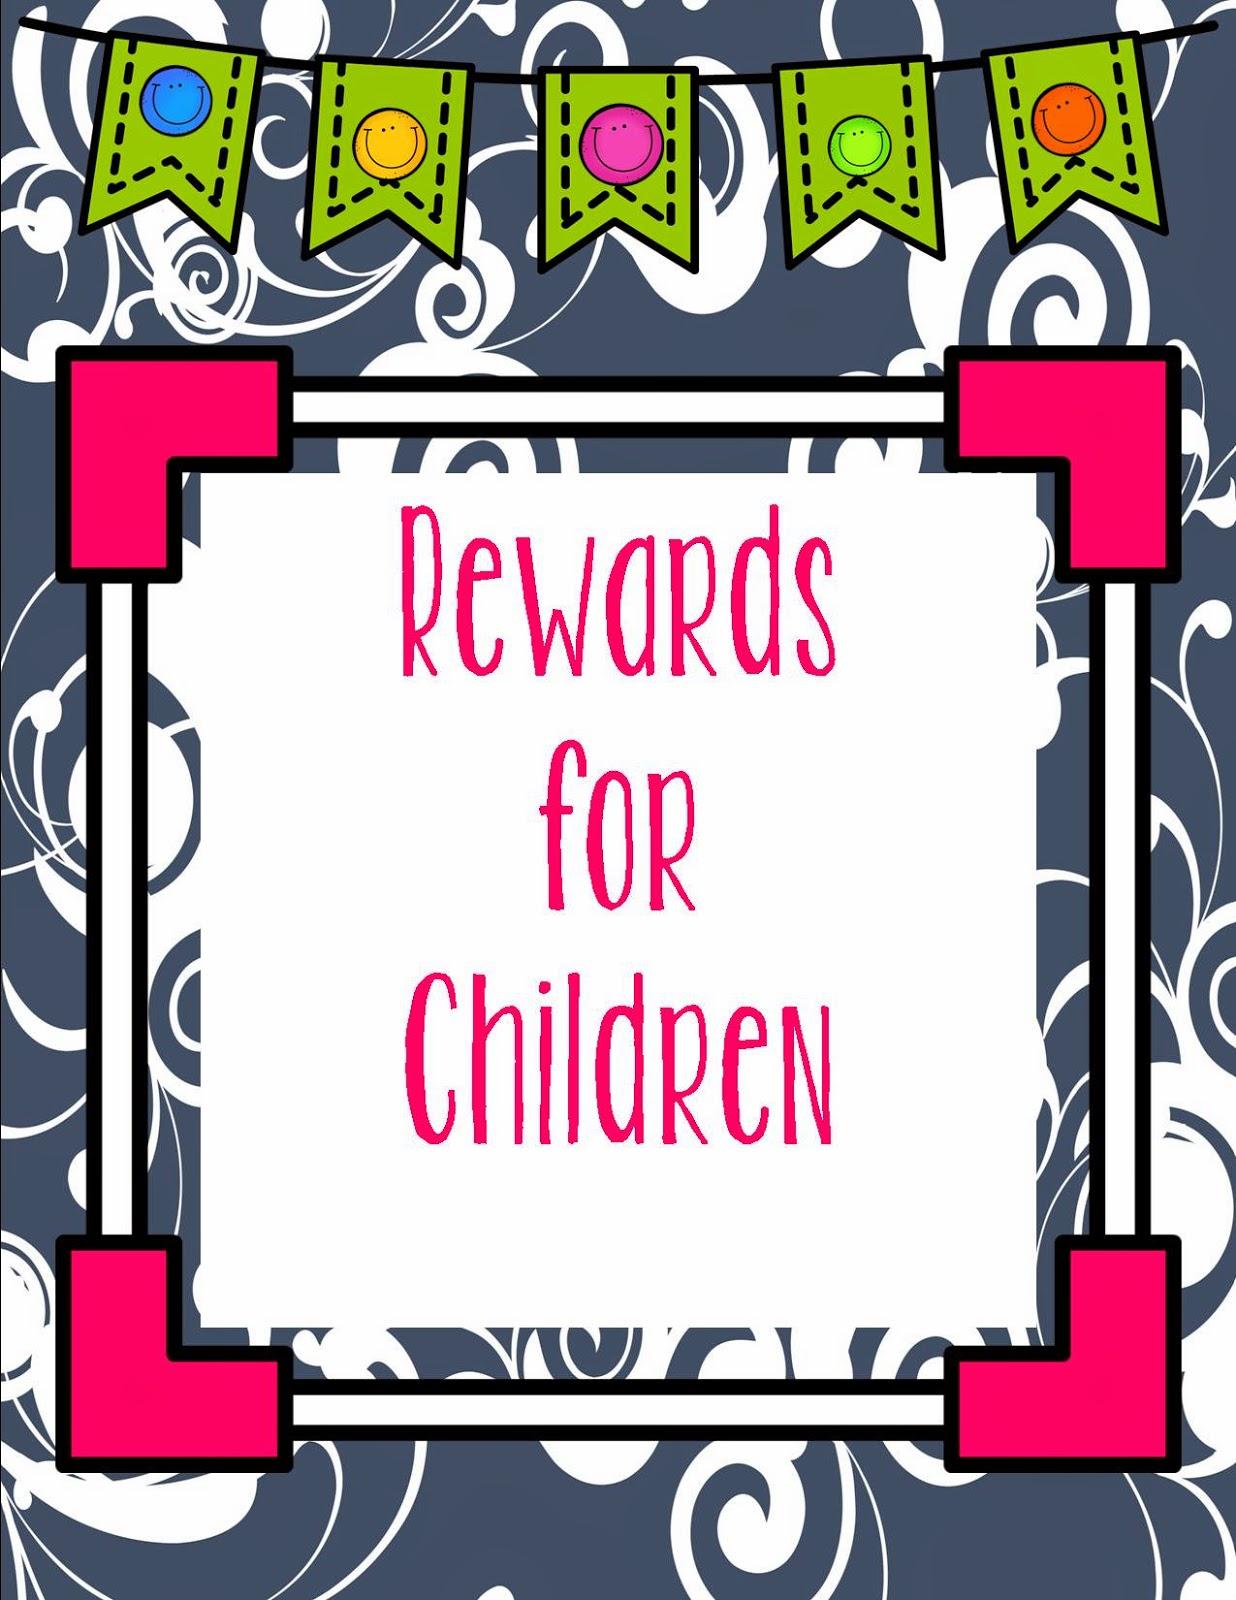 http://www.teacherspayteachers.com/Product/Punch-Card-Rewards-for-Children-1263952